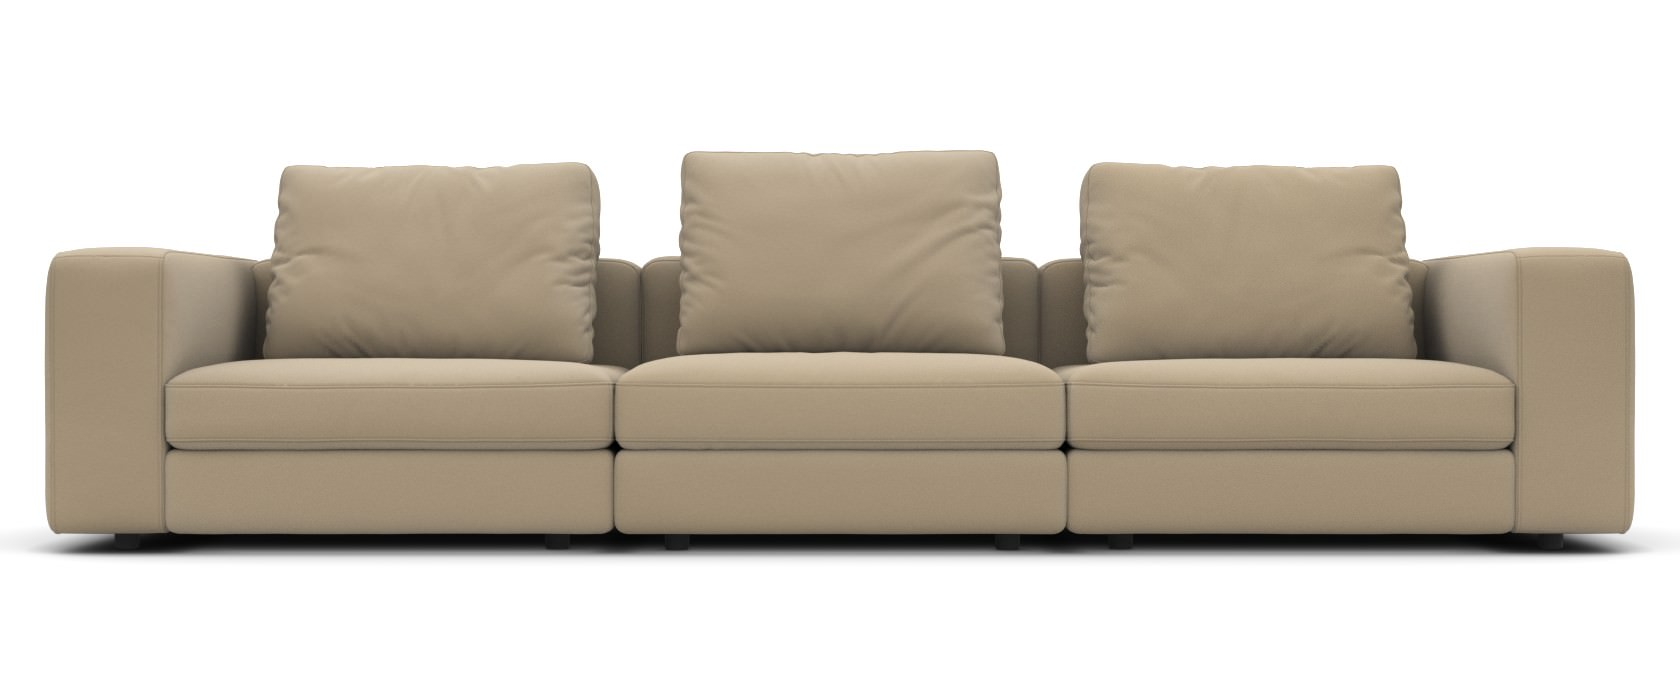 3-Sitzer Schlafsofa Domino